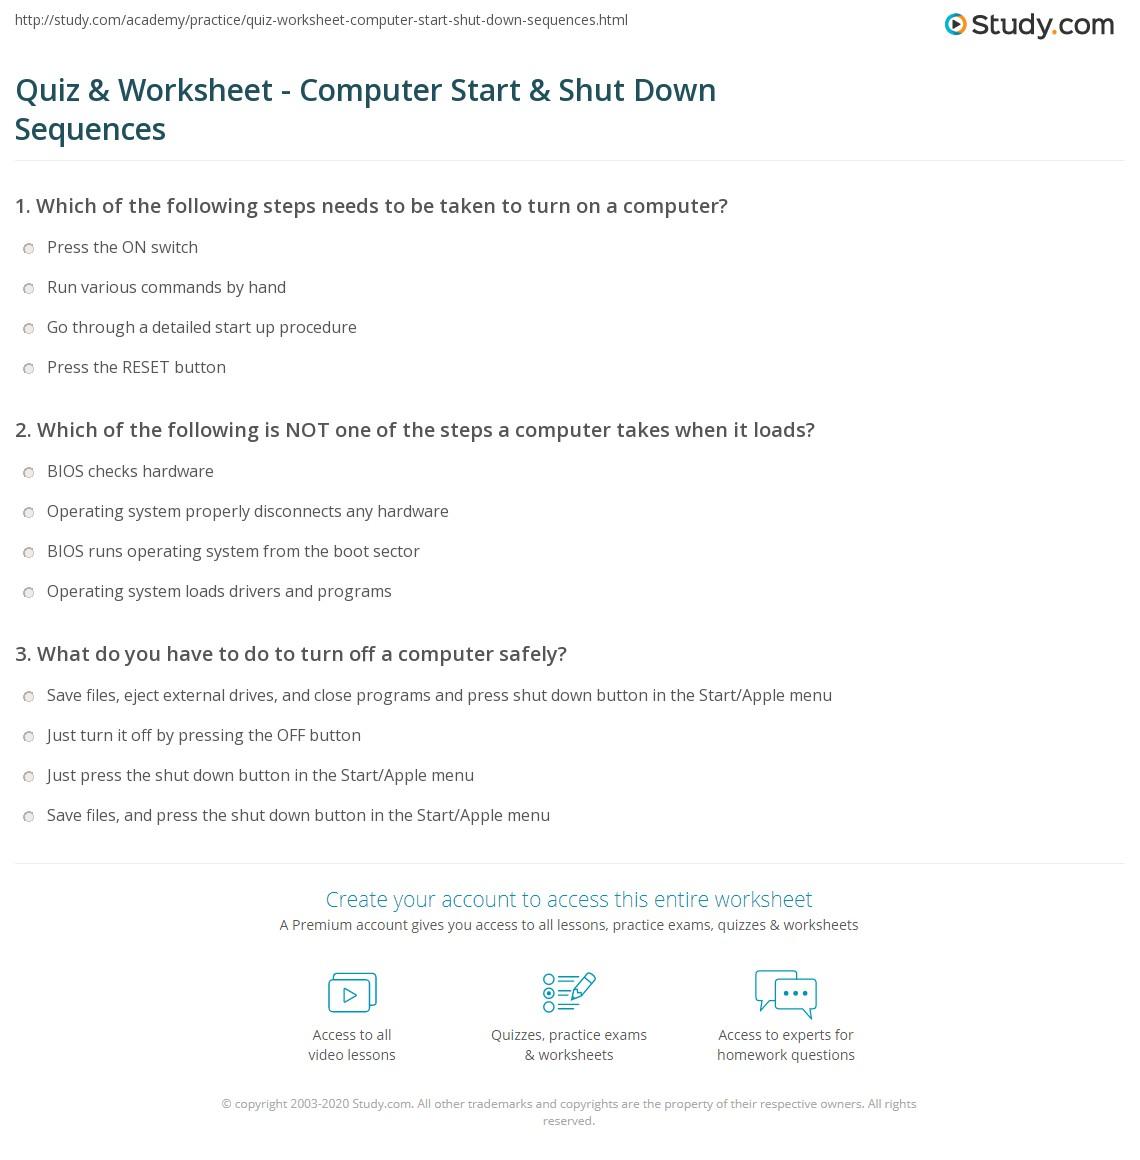 Quiz & Worksheet - Computer Start & Shut Down Sequences | Study.com